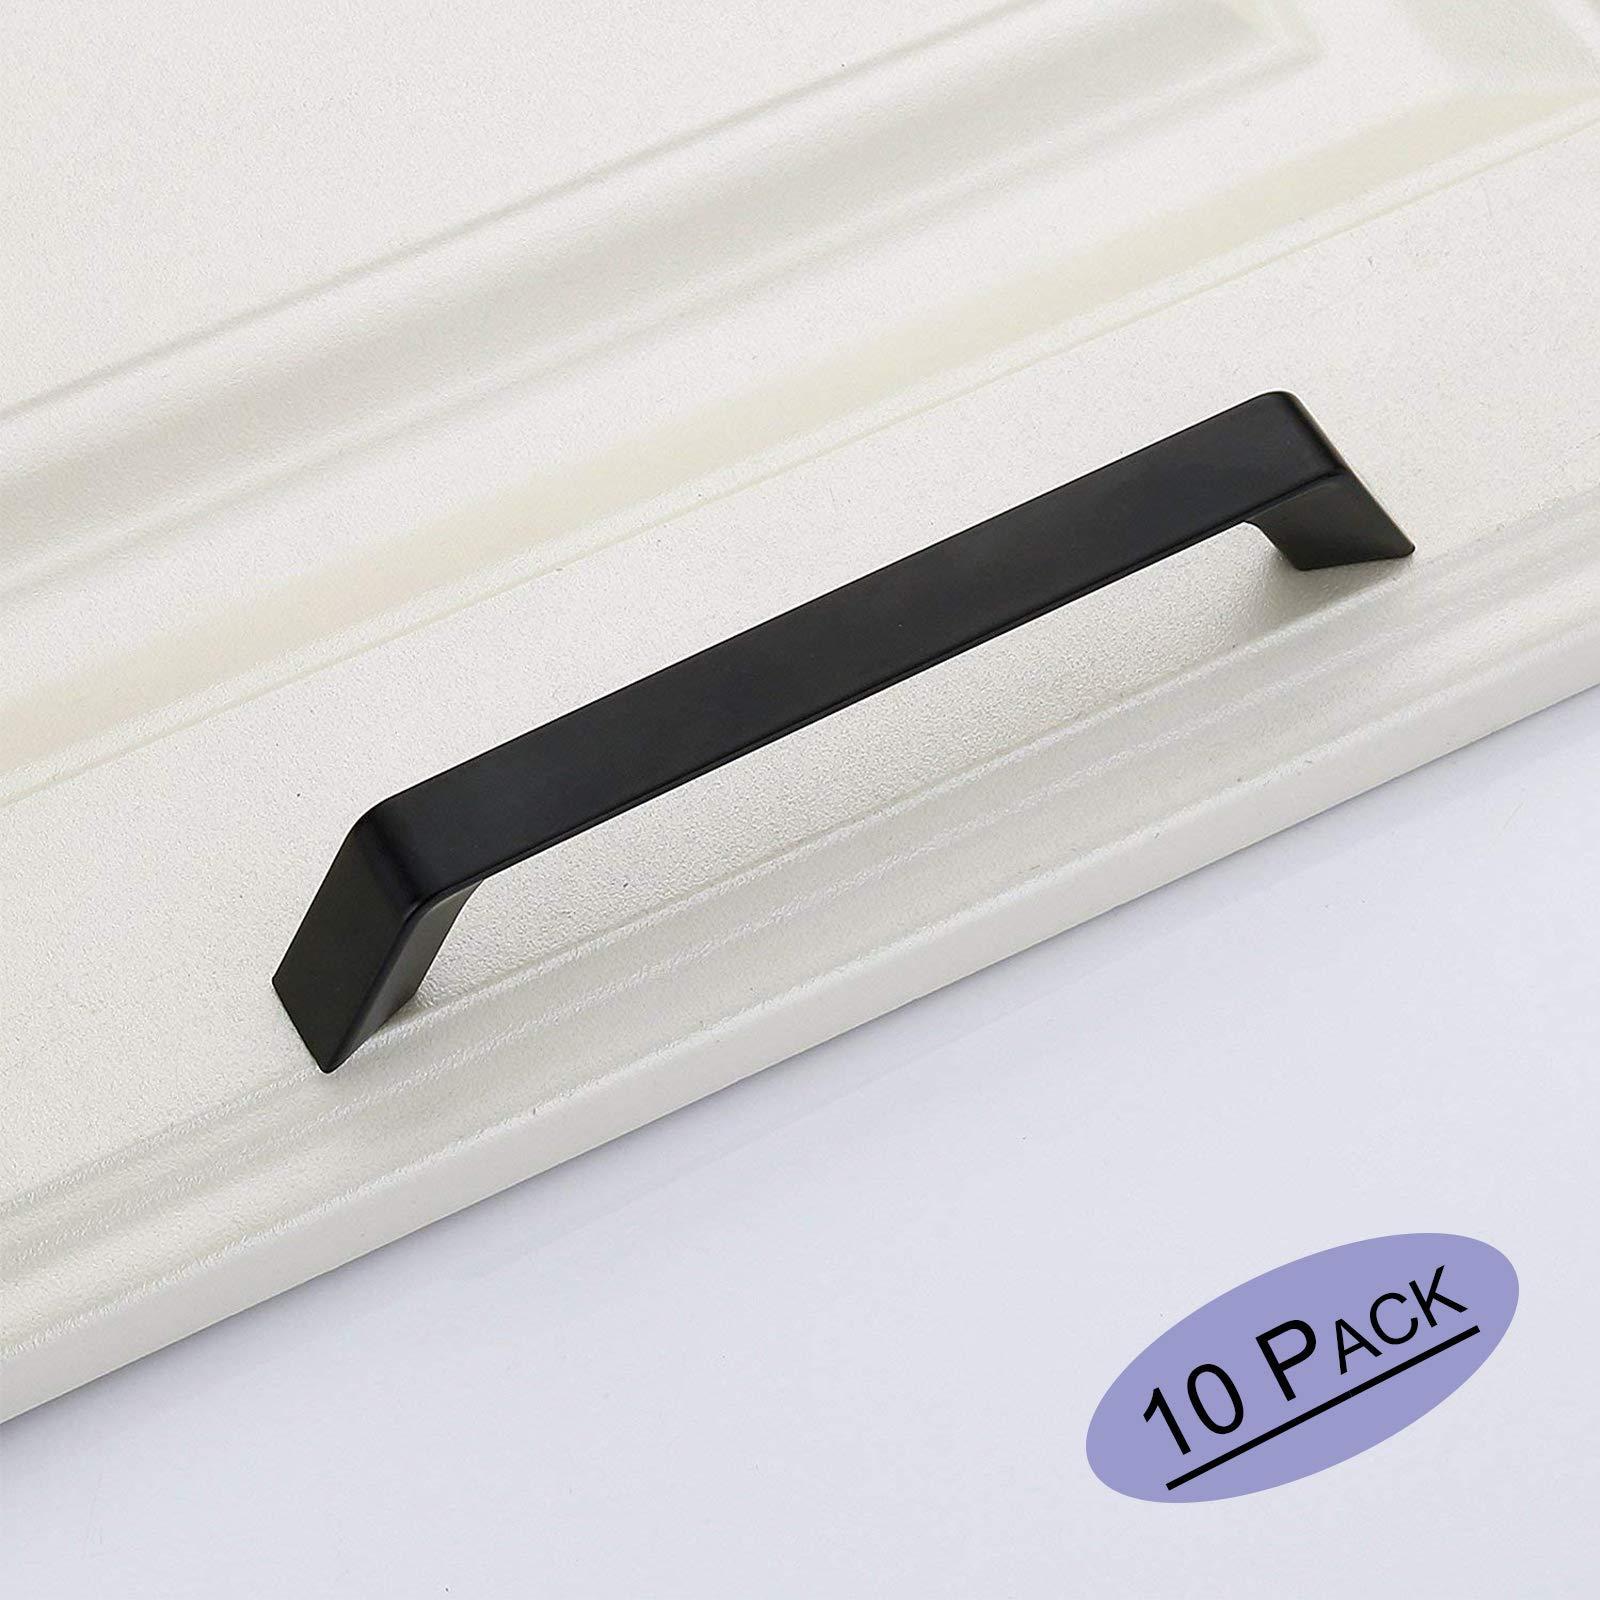 Goldenwarm Modern Black Kitchen Cabinet Handles Curved Arch Dresser Drawer Pulls Ls6785bk128 Black Cabinet Hardware Solid Cabinet Door Handle 5inch Hole Centers Pack Of 10 Amazon Com